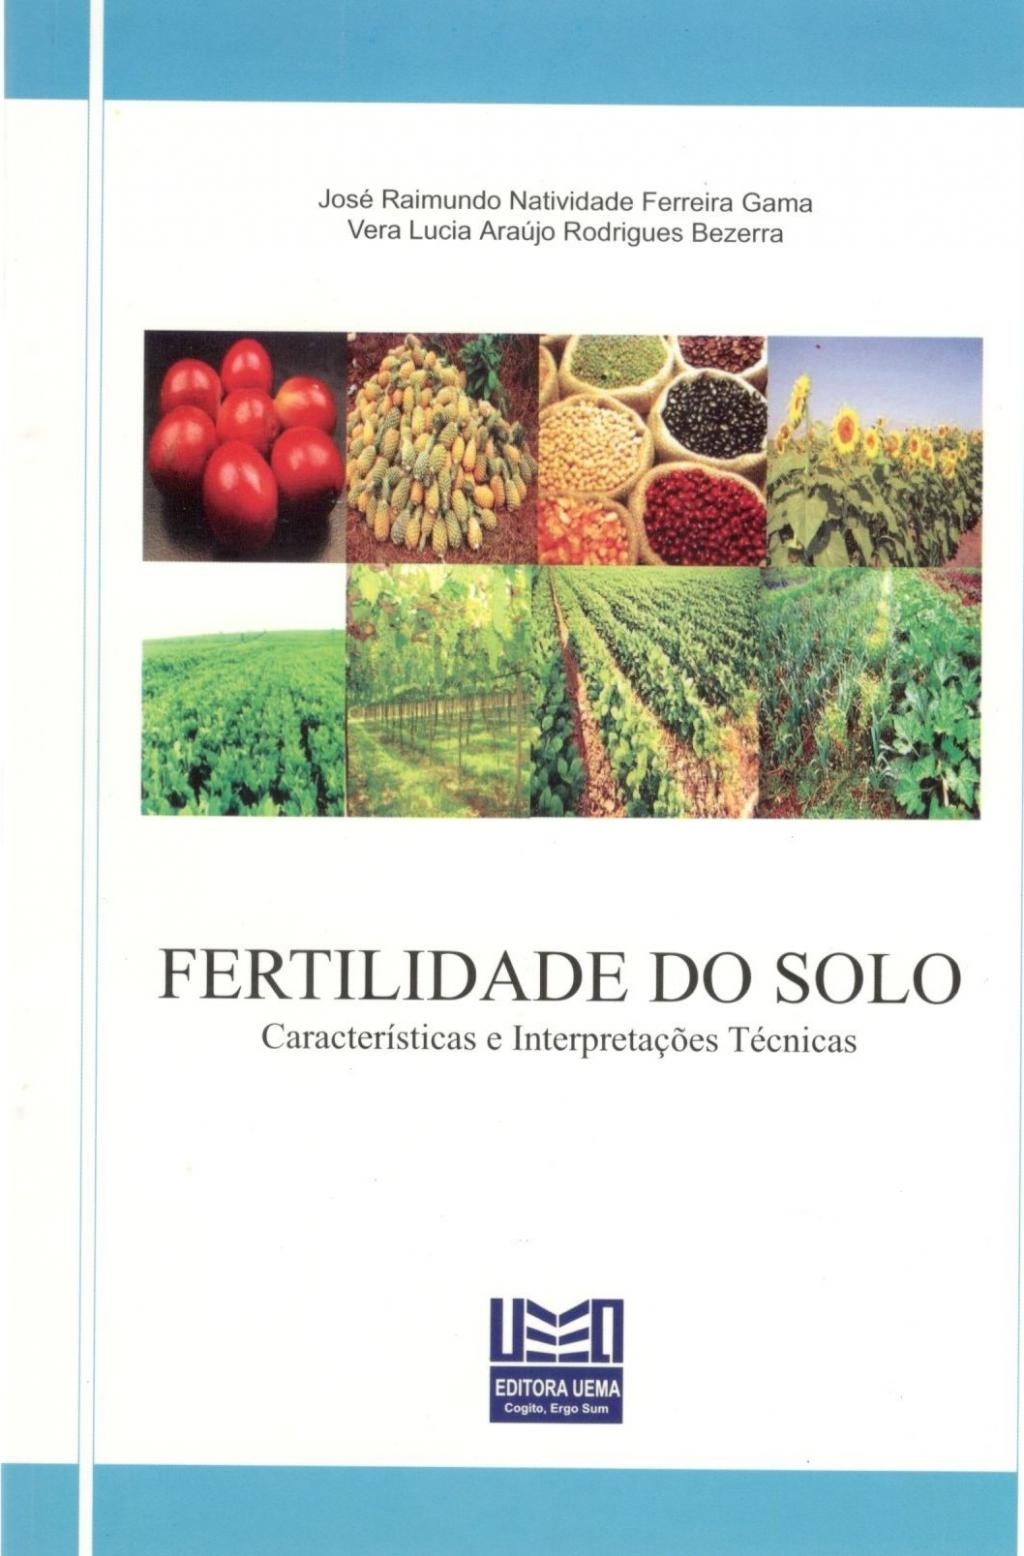 Fertilidade do solo Características e interpretações técnicas